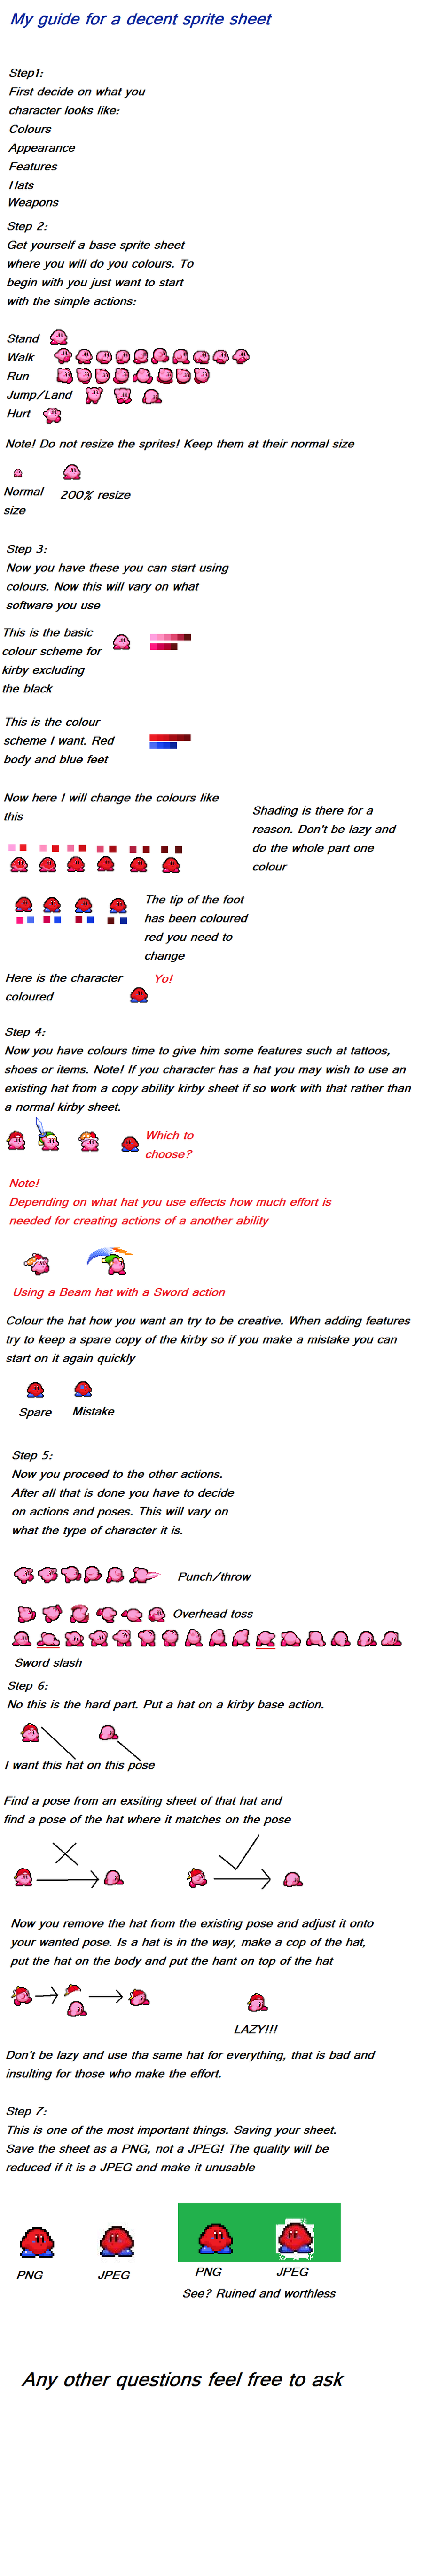 Kirby sprite sheet tutorial by BioMetalNeo